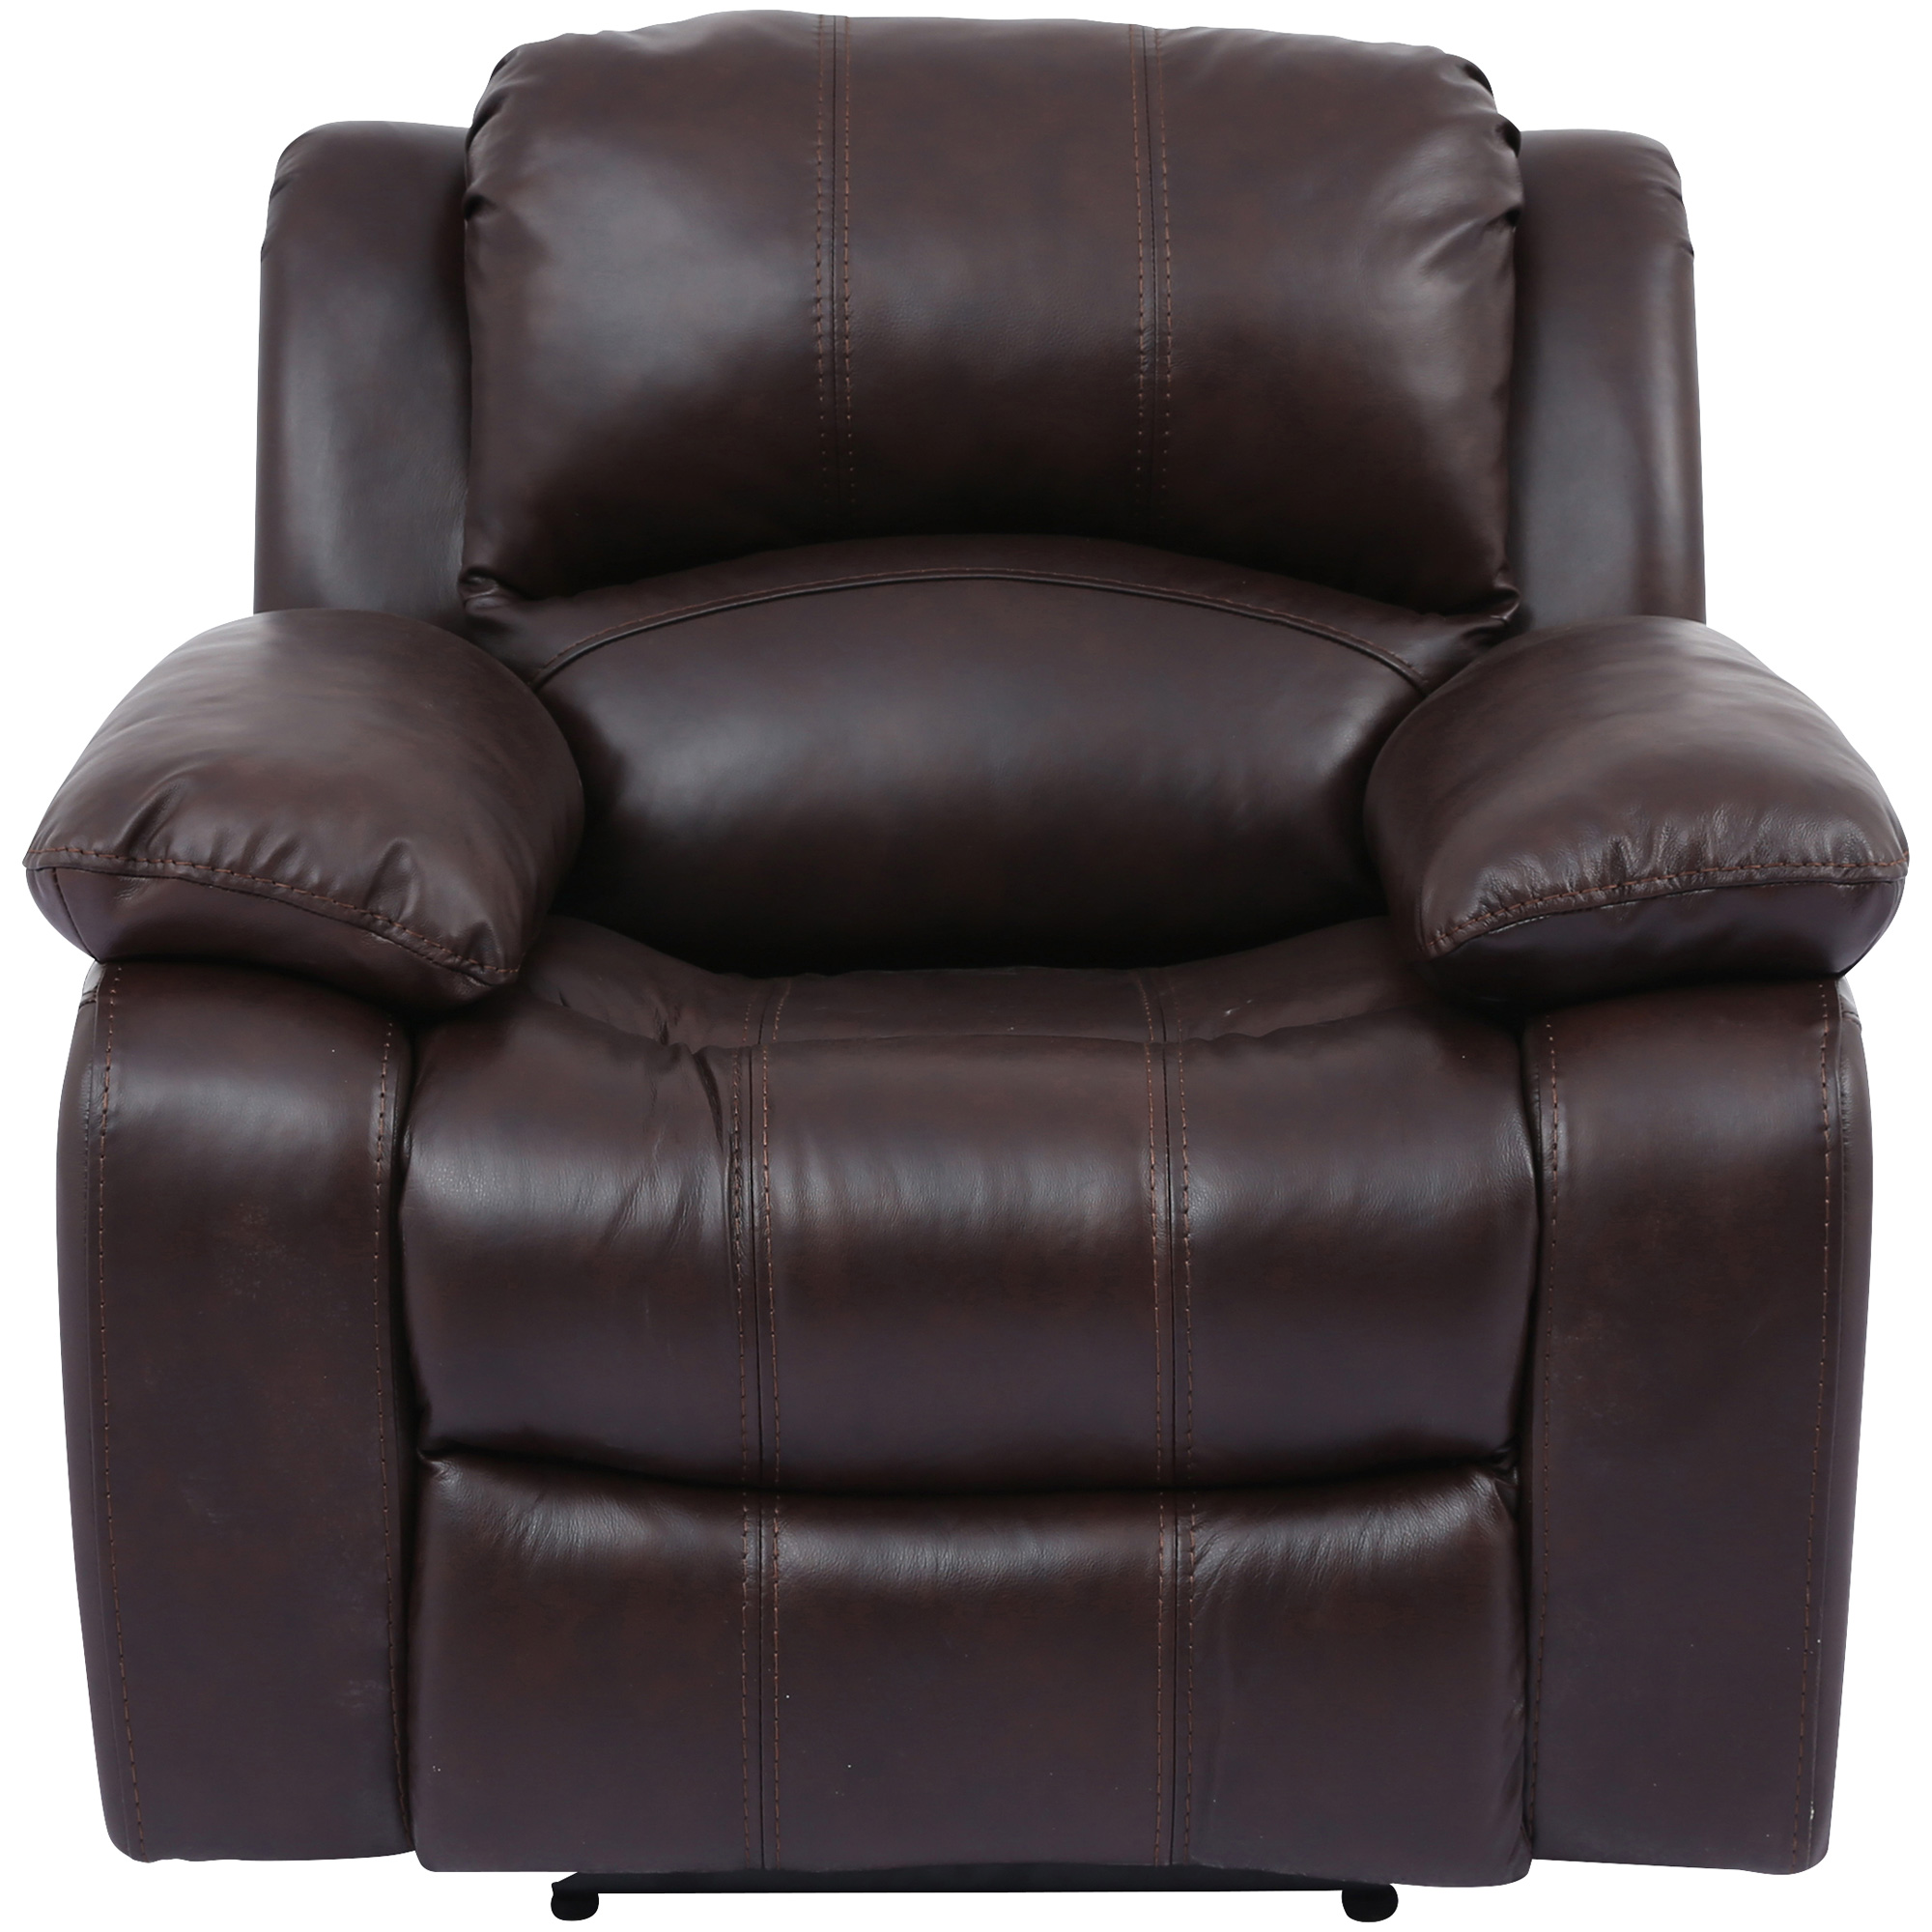 Wah Cheers | Ender Brown Leather Power+ Recliner Chair